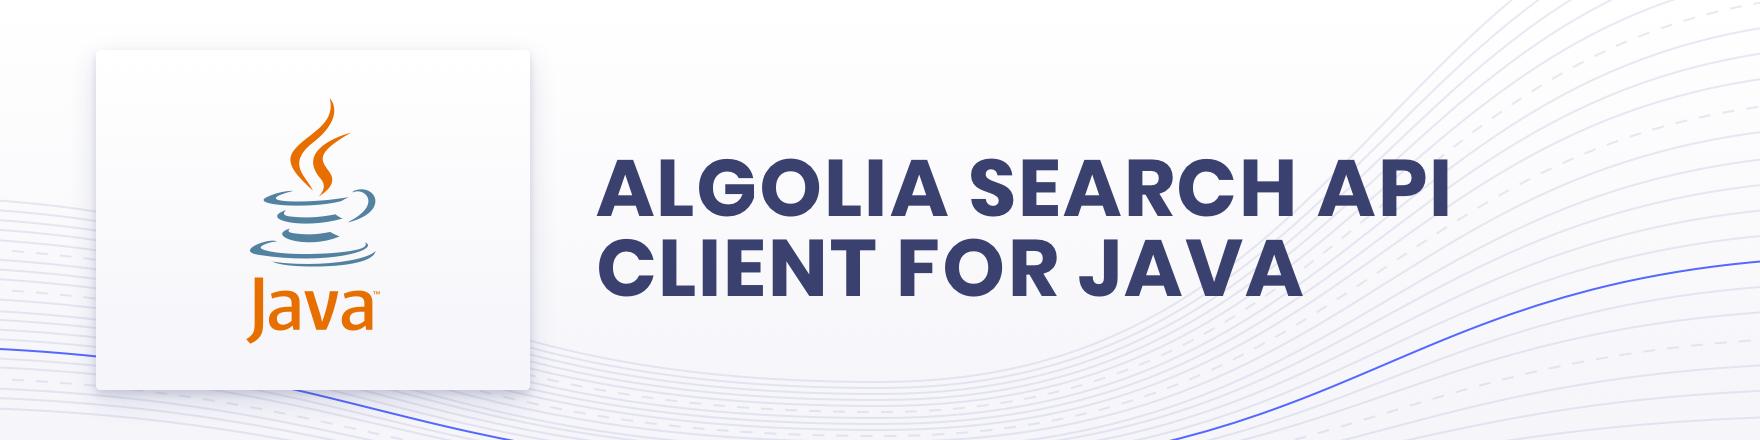 Algolia for Java